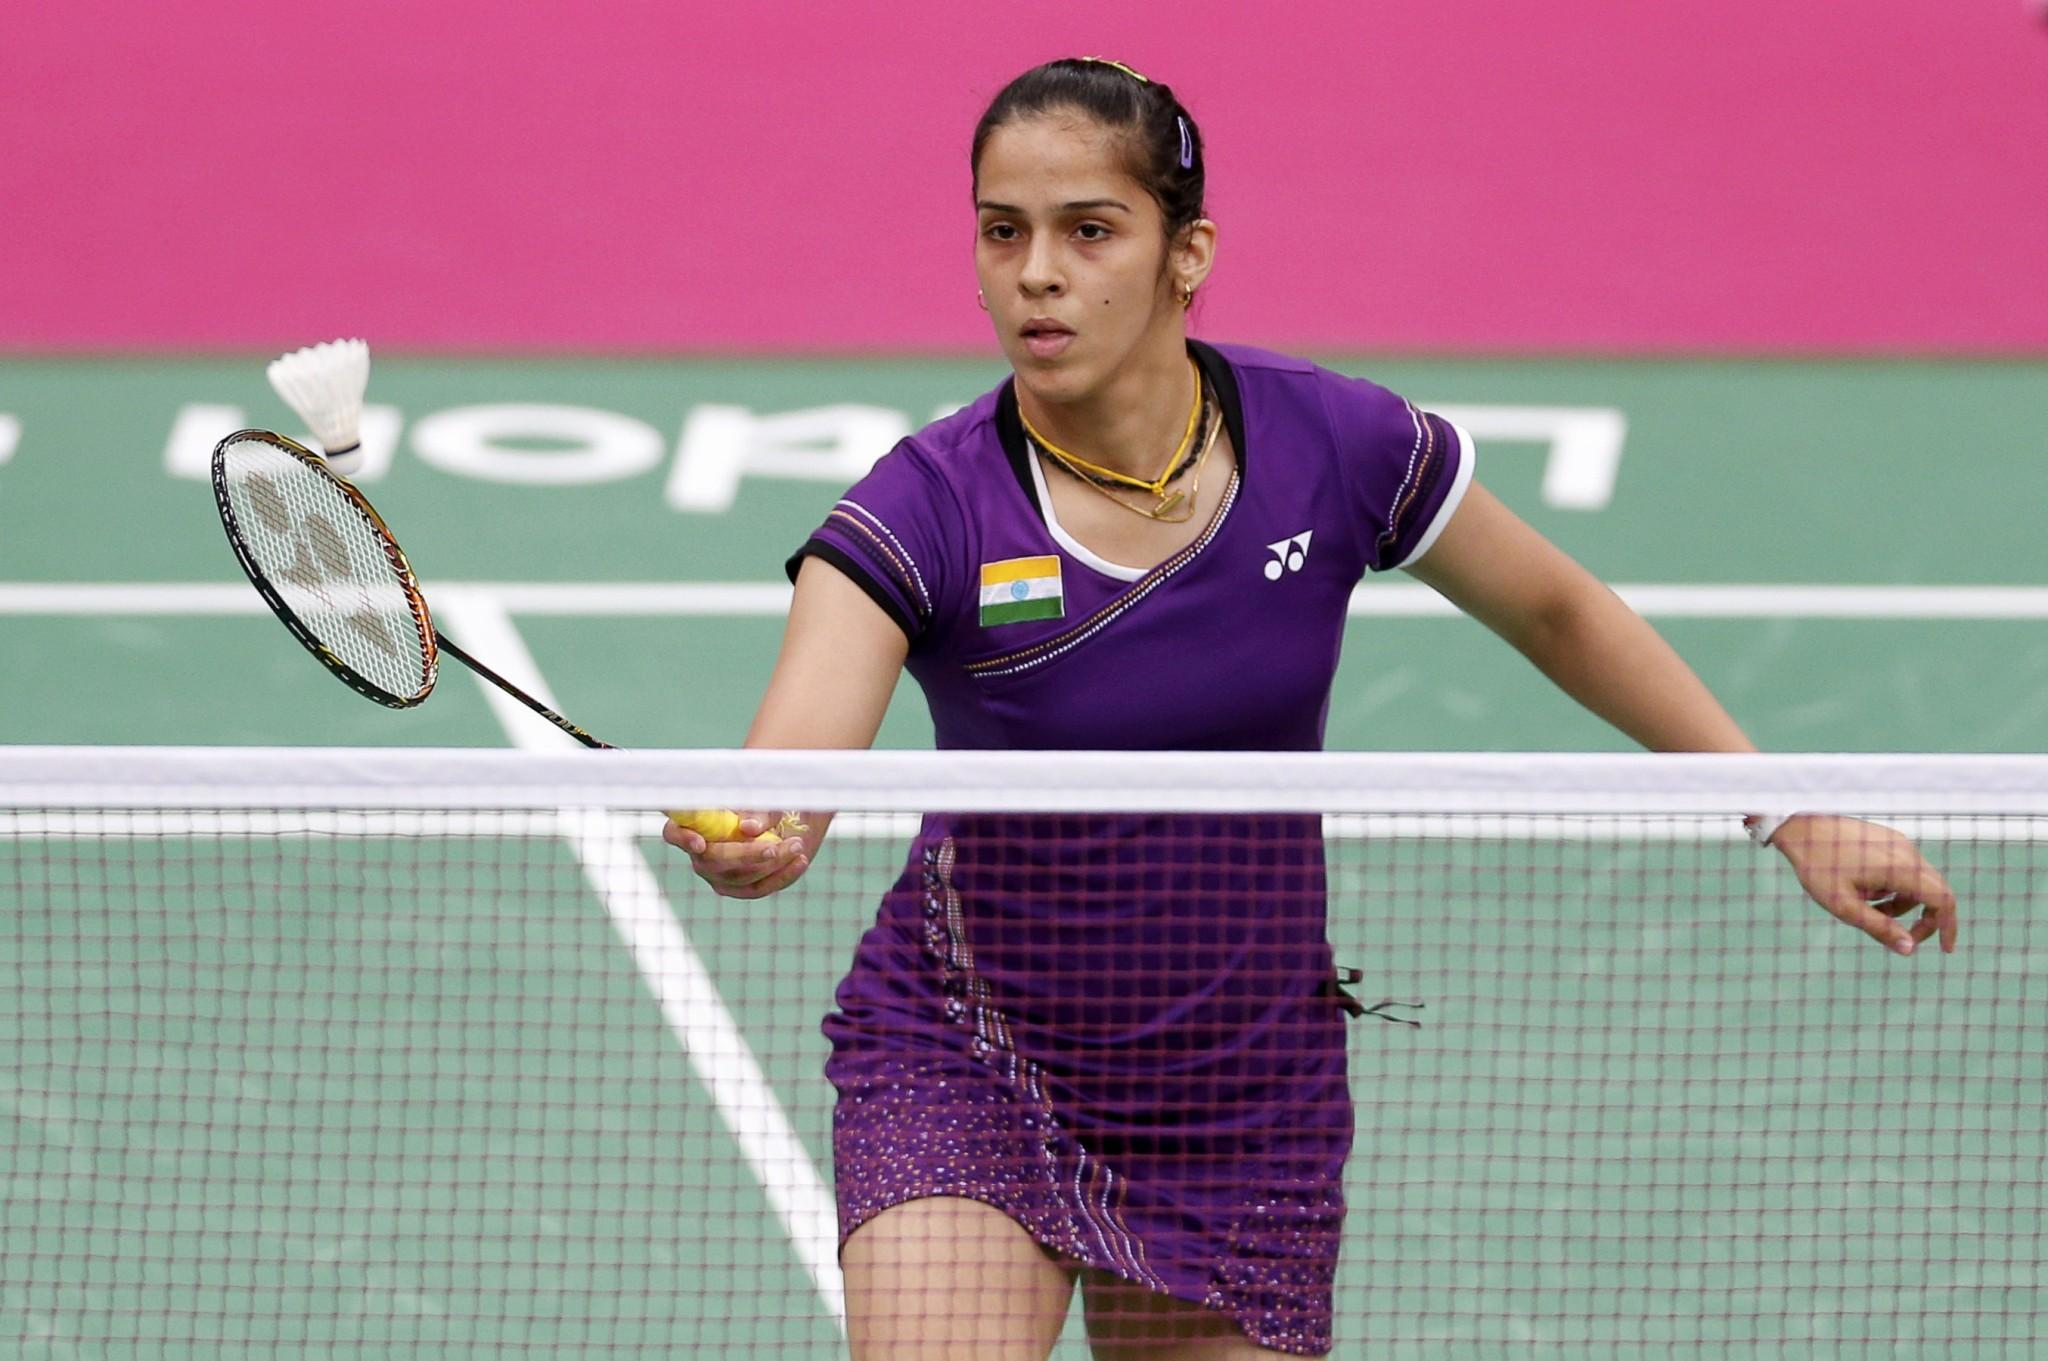 Saina made the country proud, Sonia Gandhi praises the star player